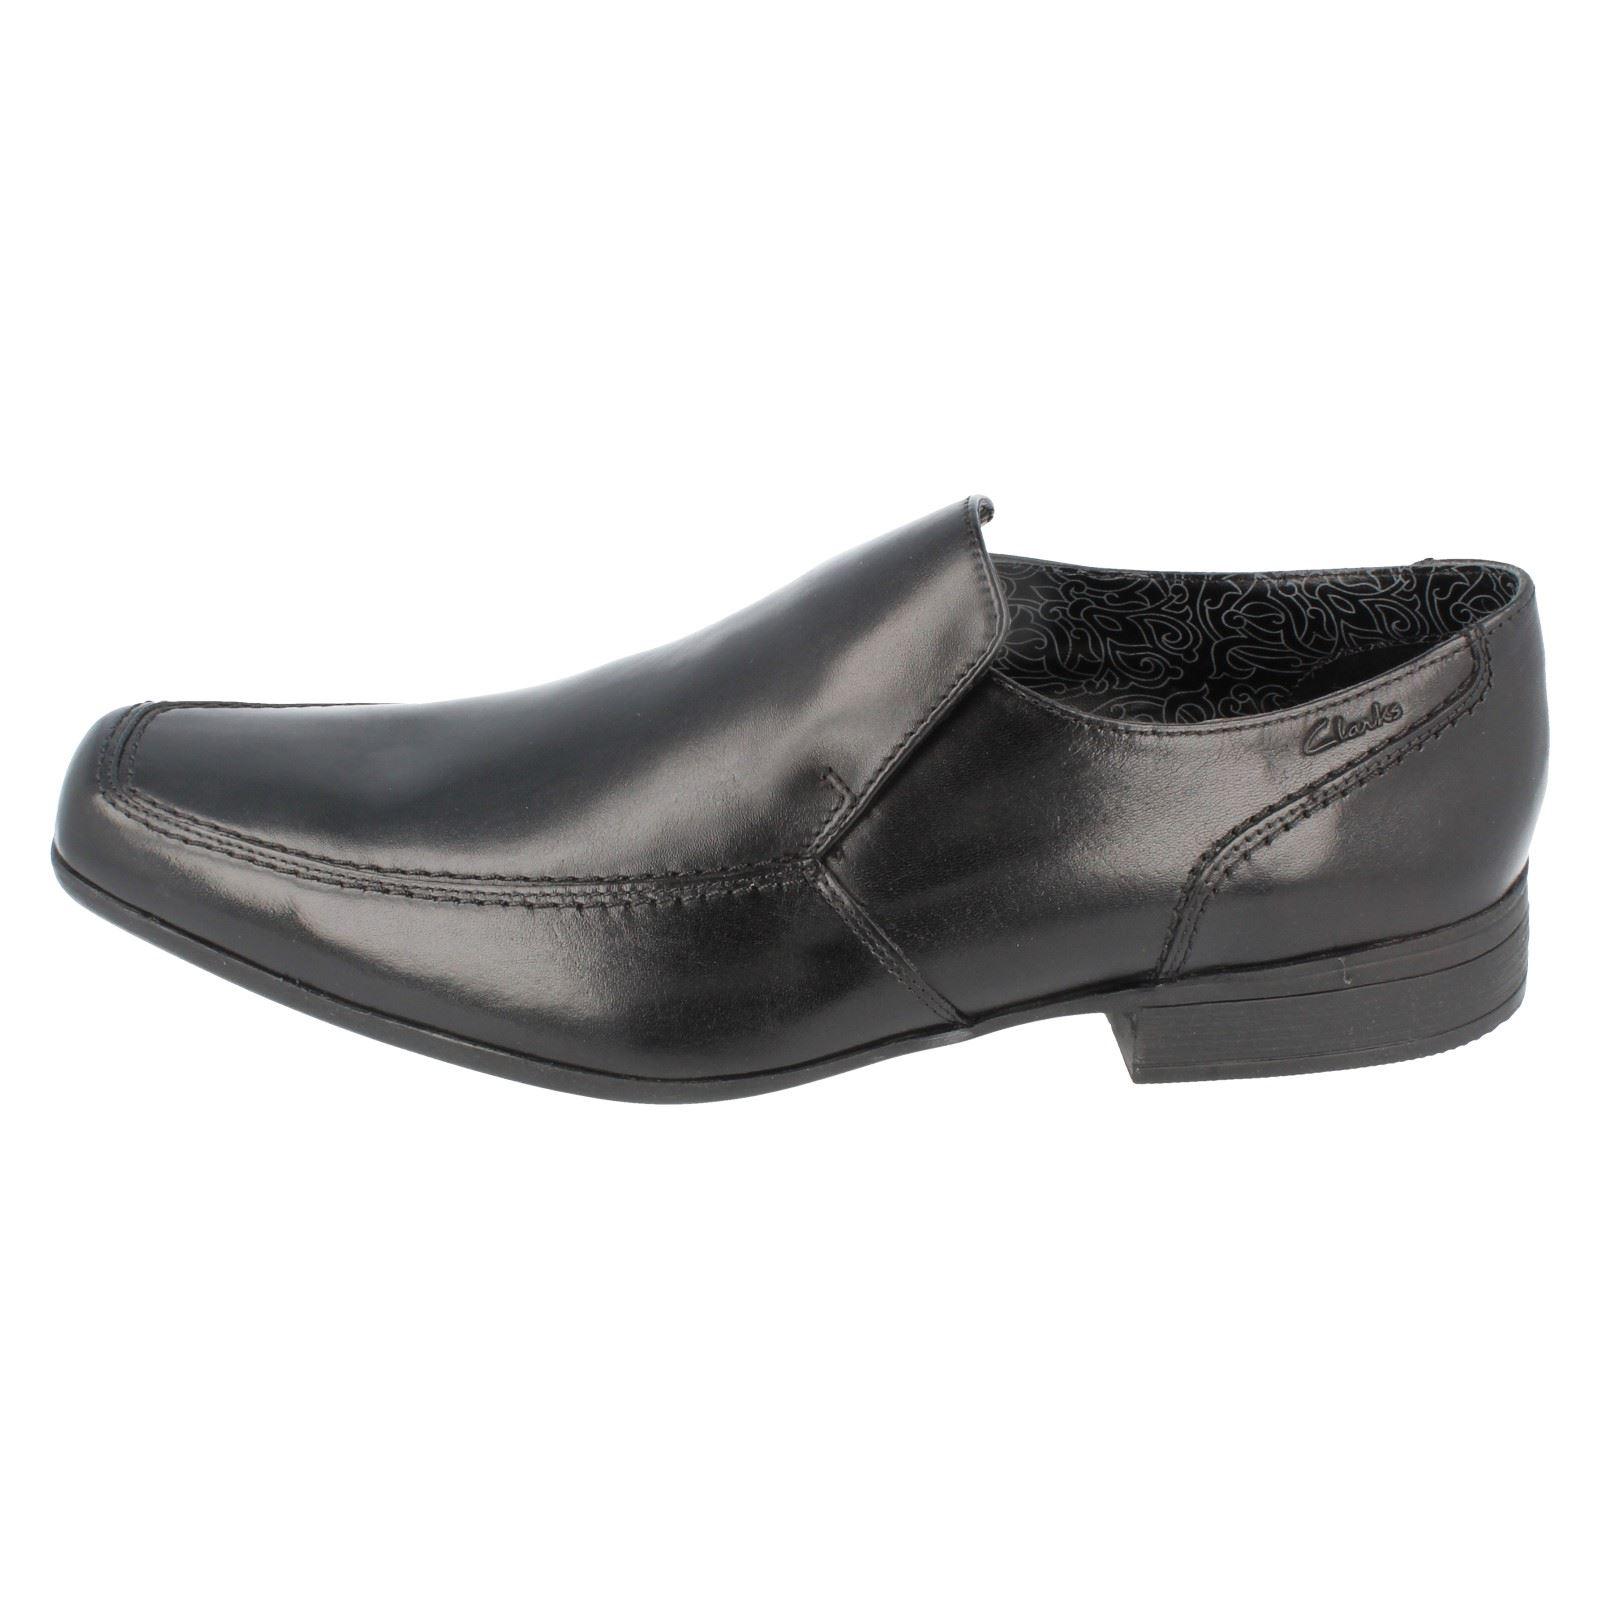 Mens Clarks Slip On Shoes Label  Bze Night ~ N